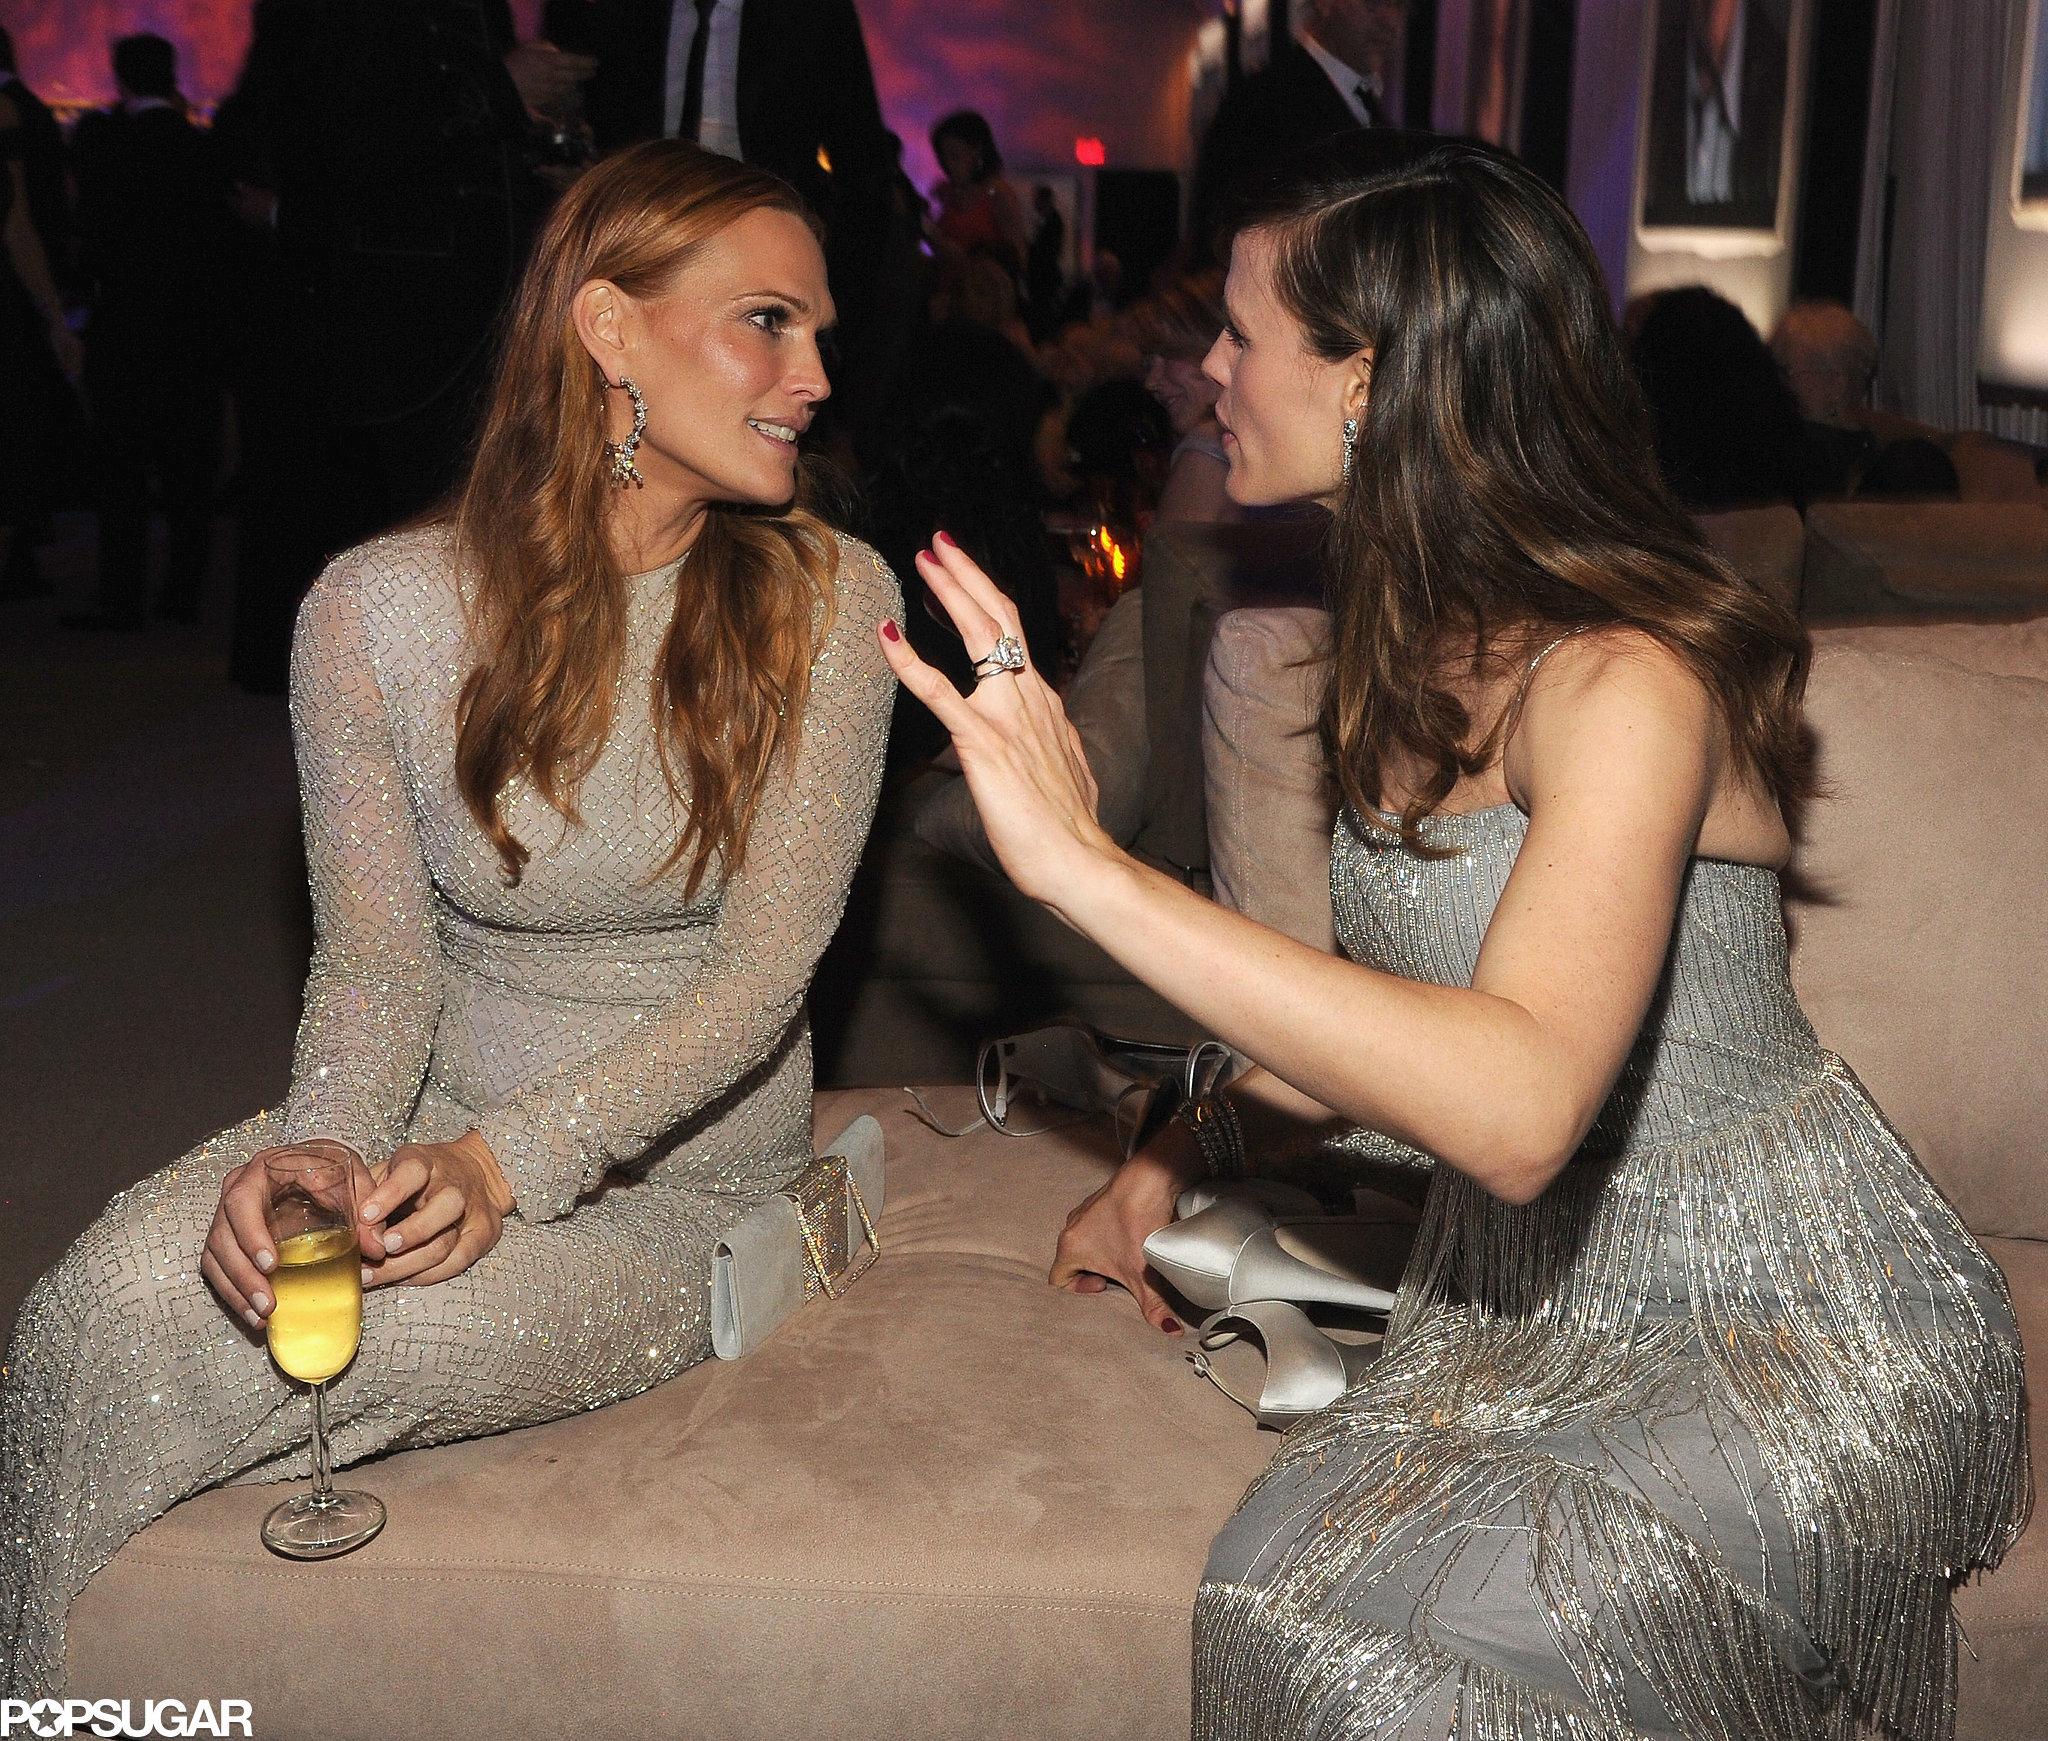 Molly Sims and Jennifer Garner had a serious sit-down.